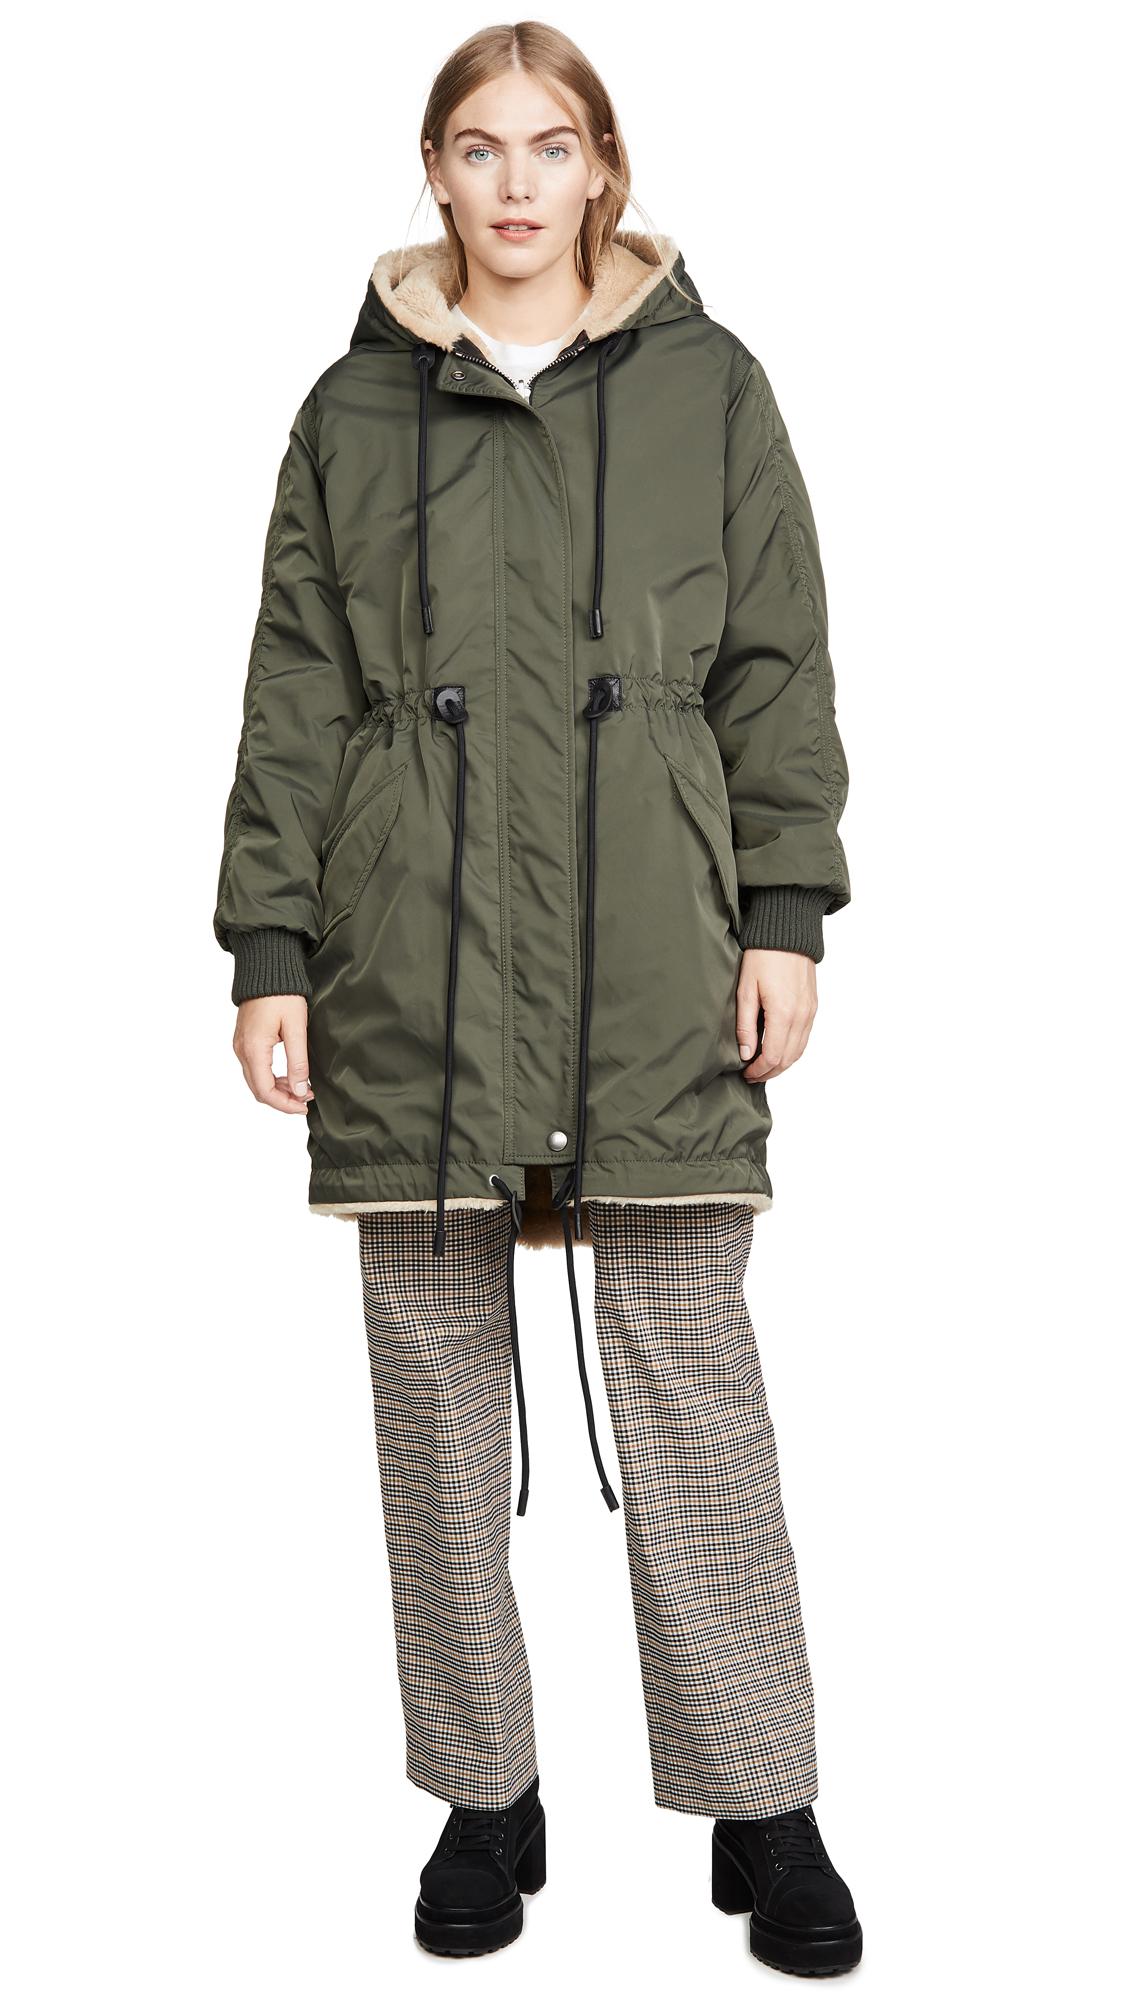 Buy Coach 1941 Reversible Shearling Parka online beautiful Coach Jackets, Coats, Down Jackets